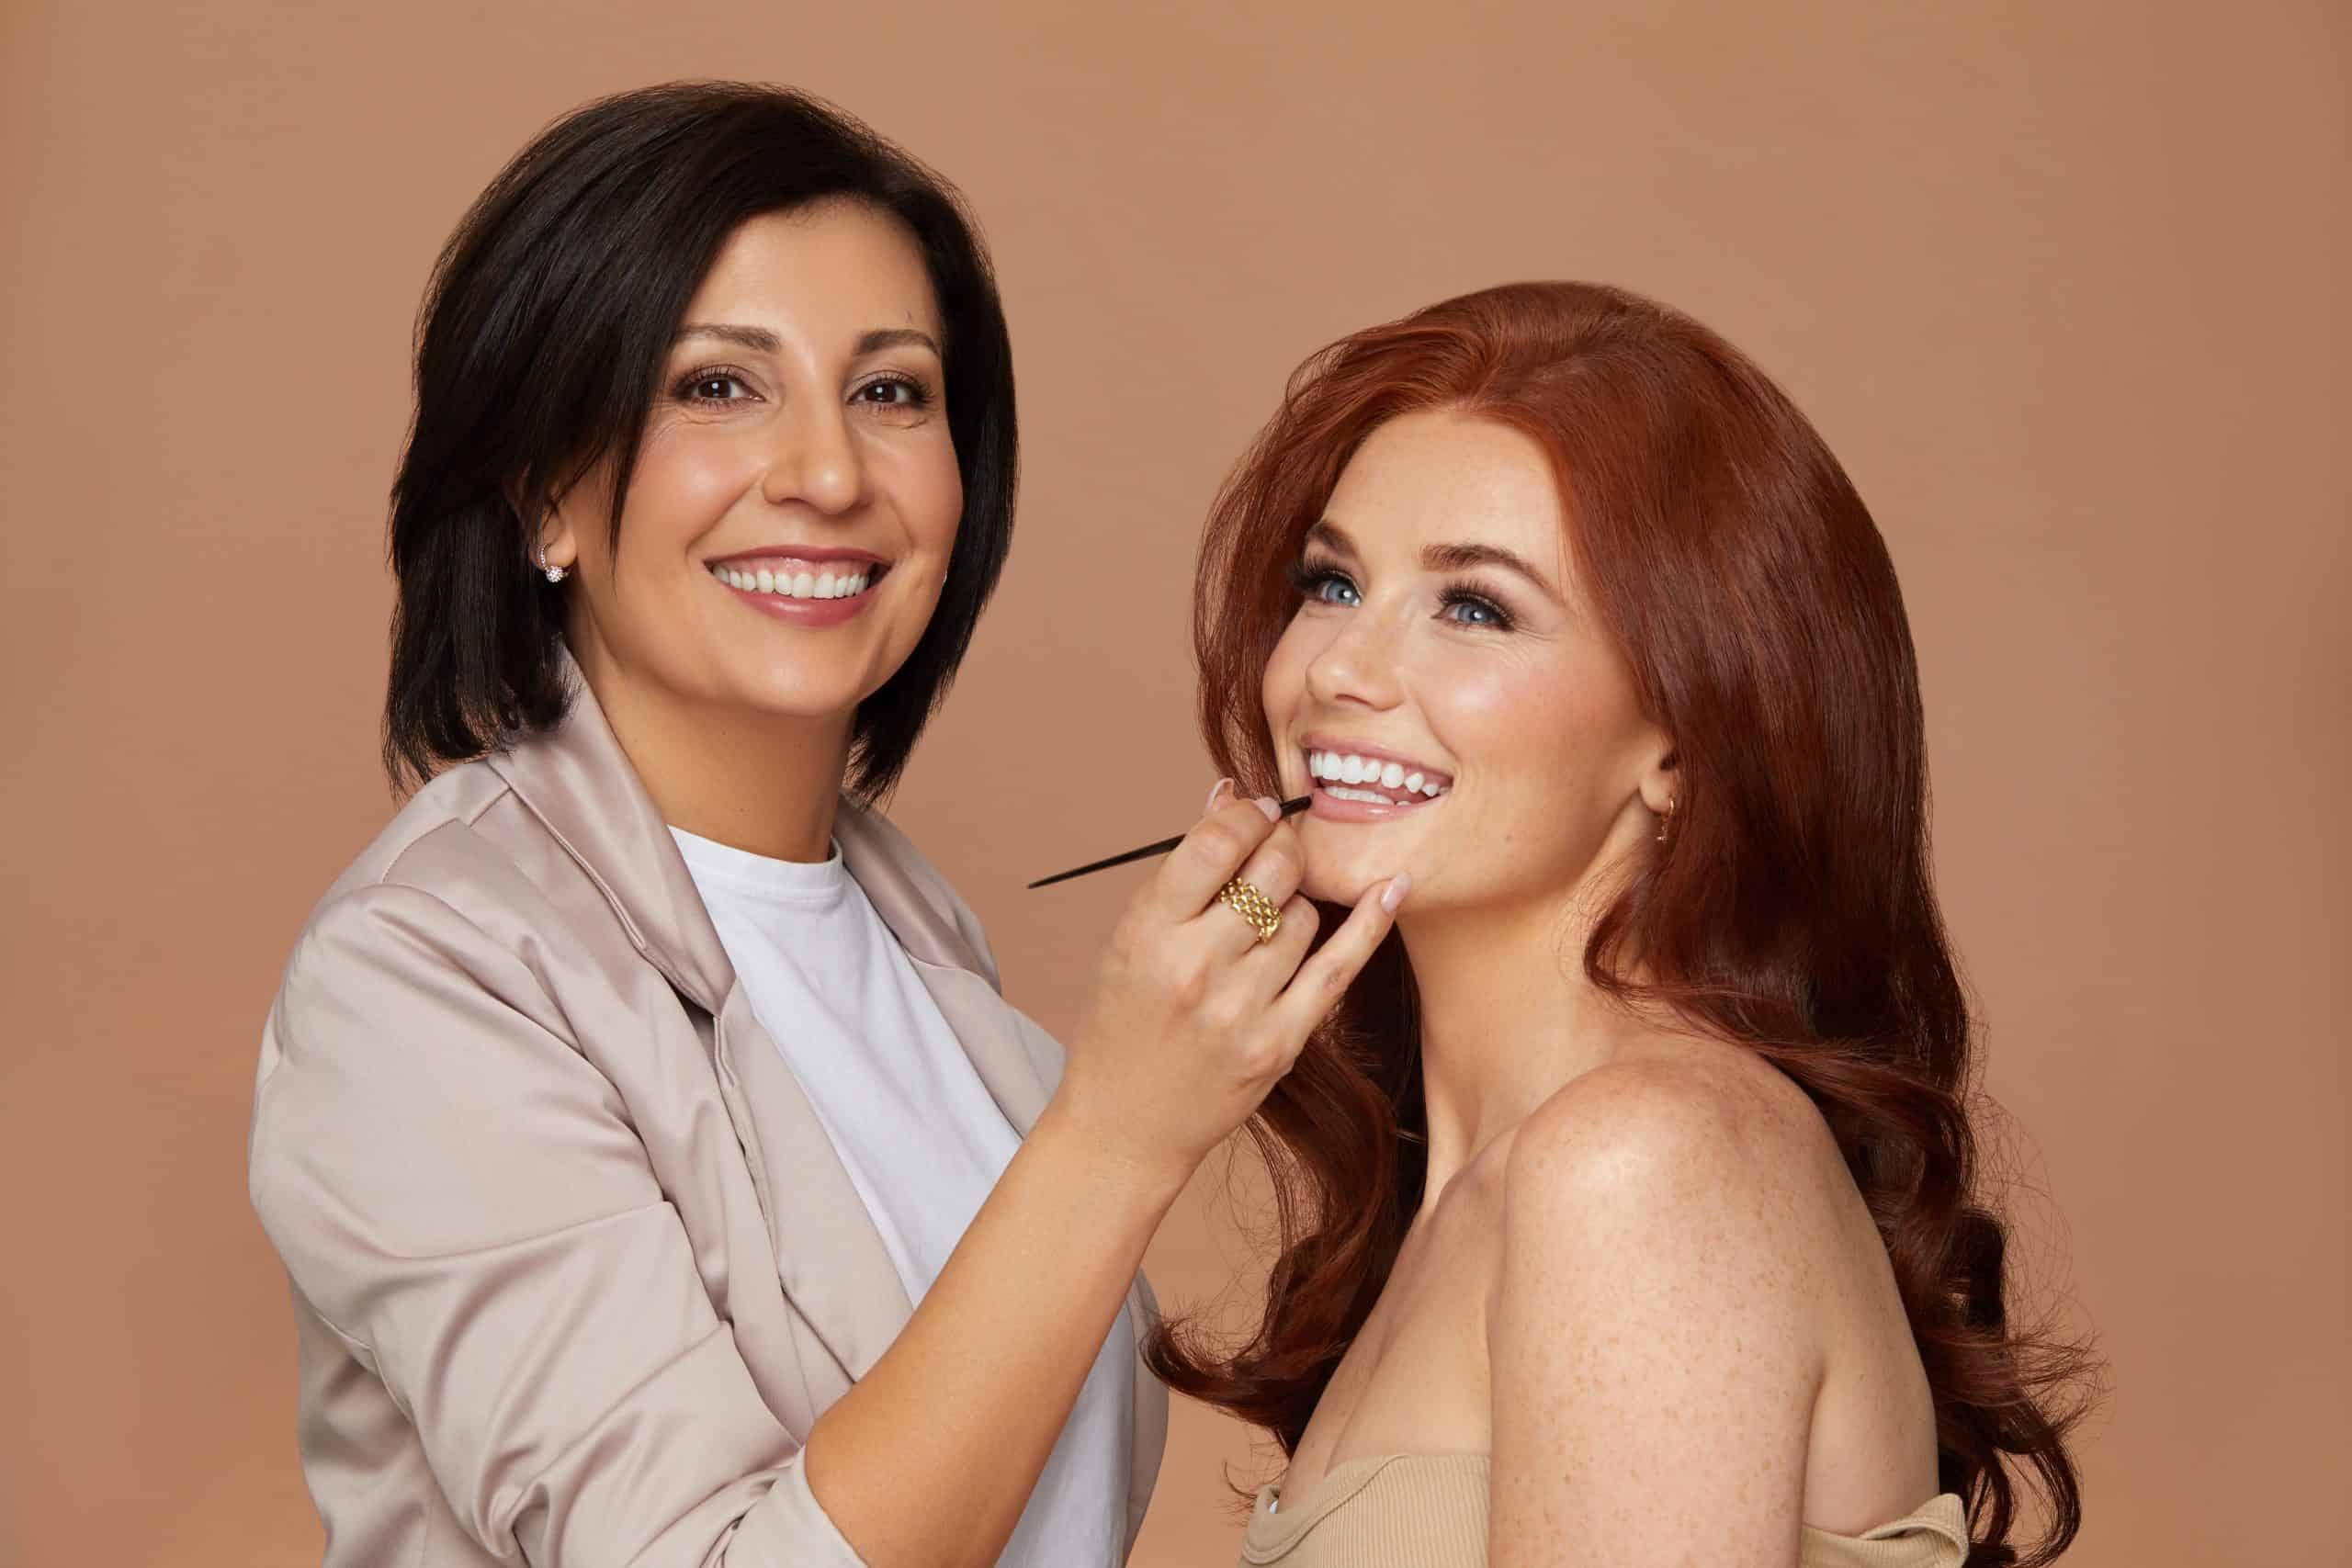 team hair and makeup artist Gladis